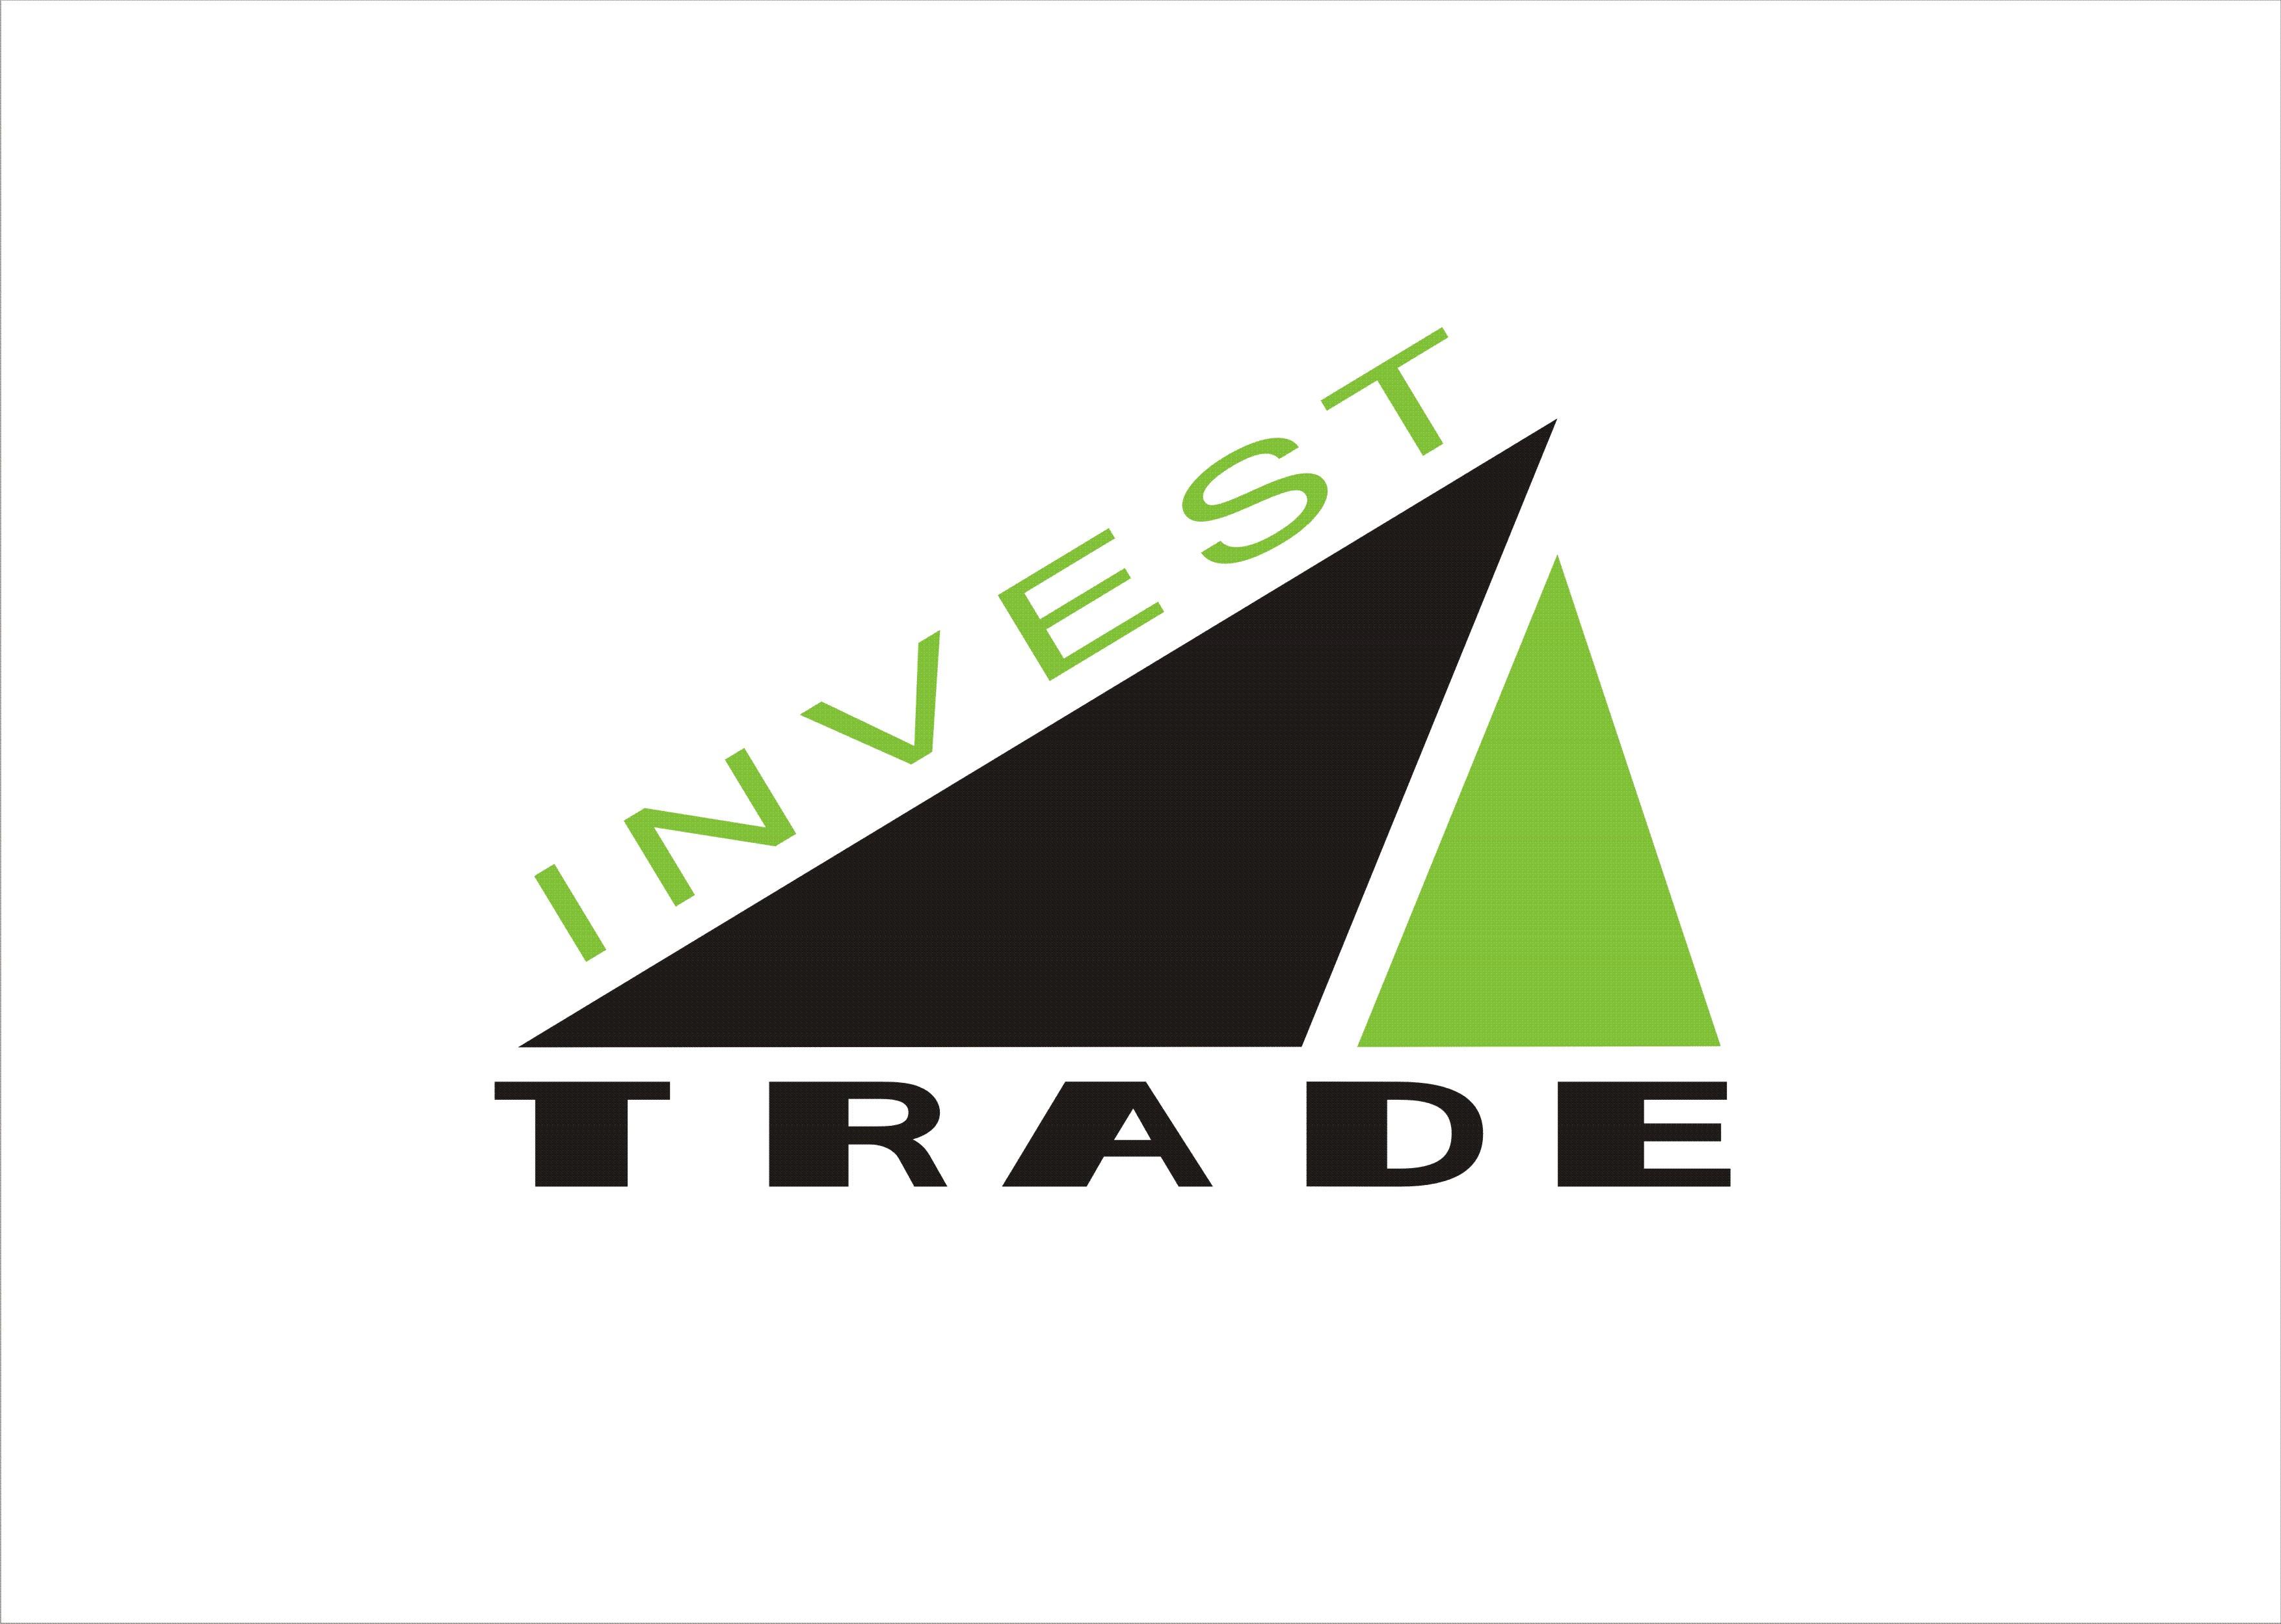 Разработка логотипа для компании Invest trade фото f_5415124045d5d80b.jpg